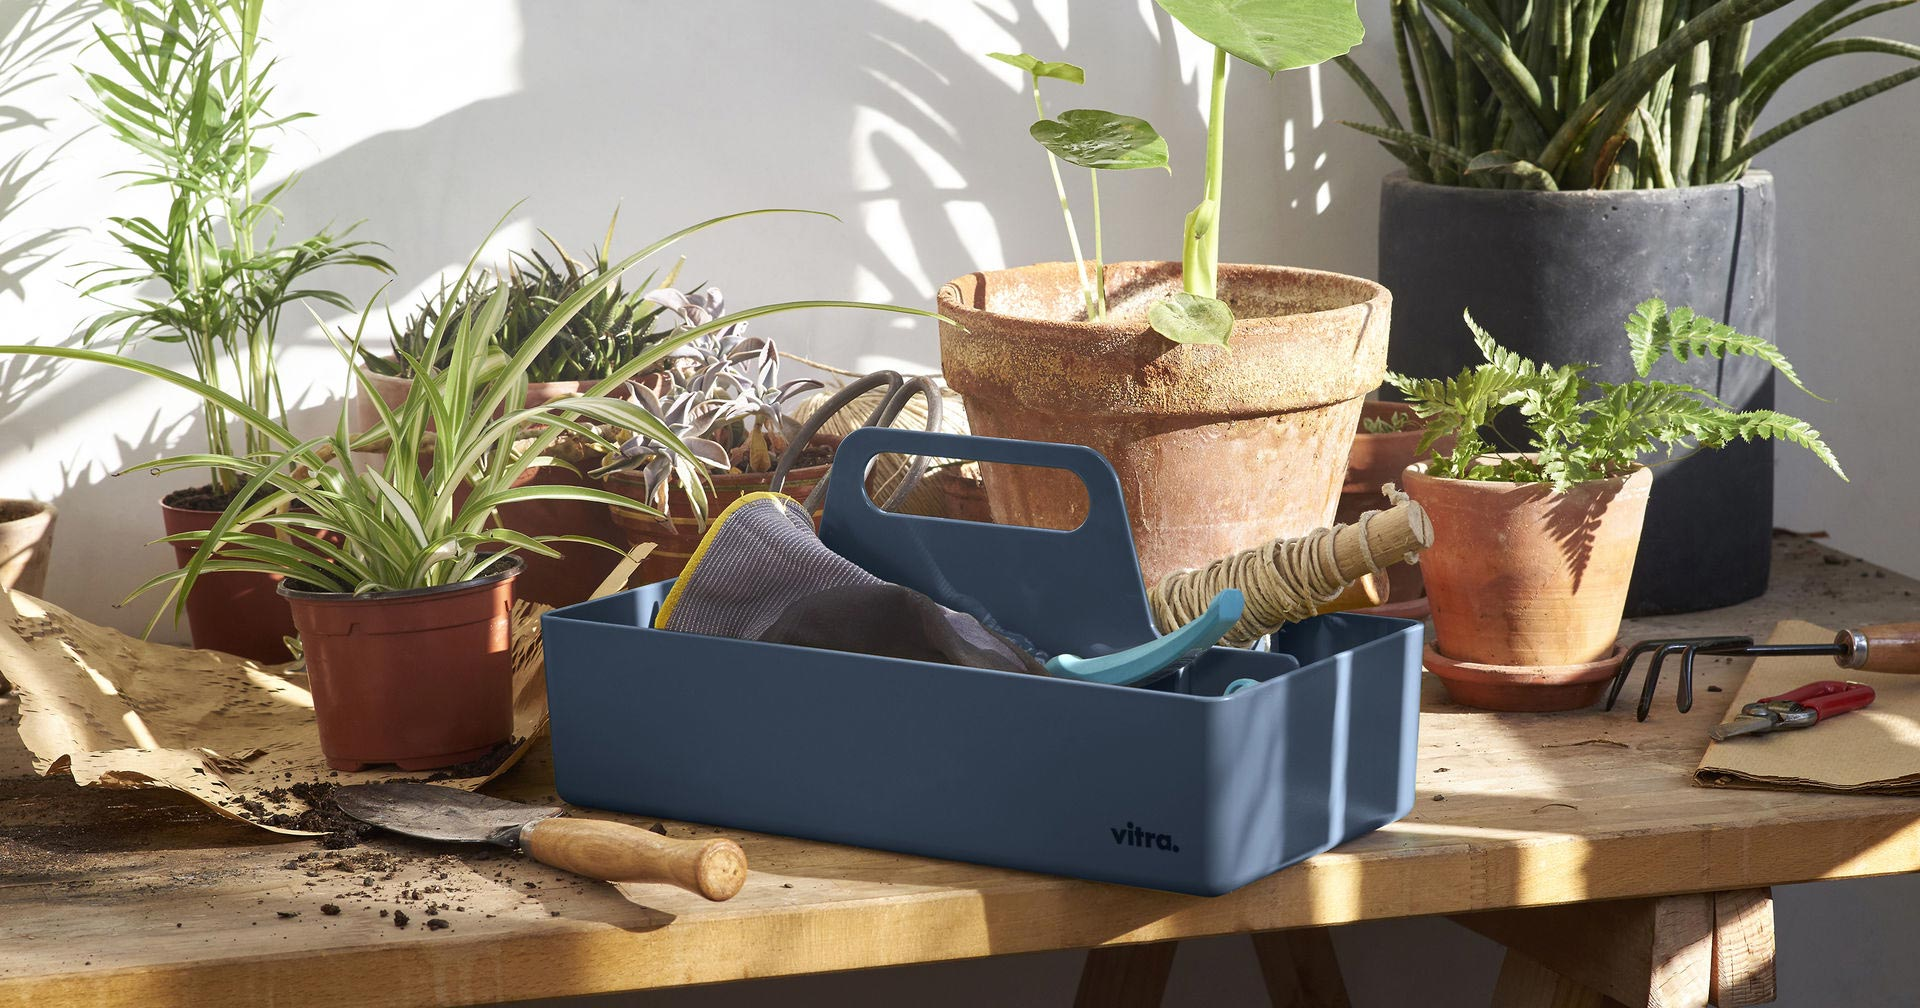 Vitra Toolbox By Arik Levy 83 Sea Blue Lifestyle Image